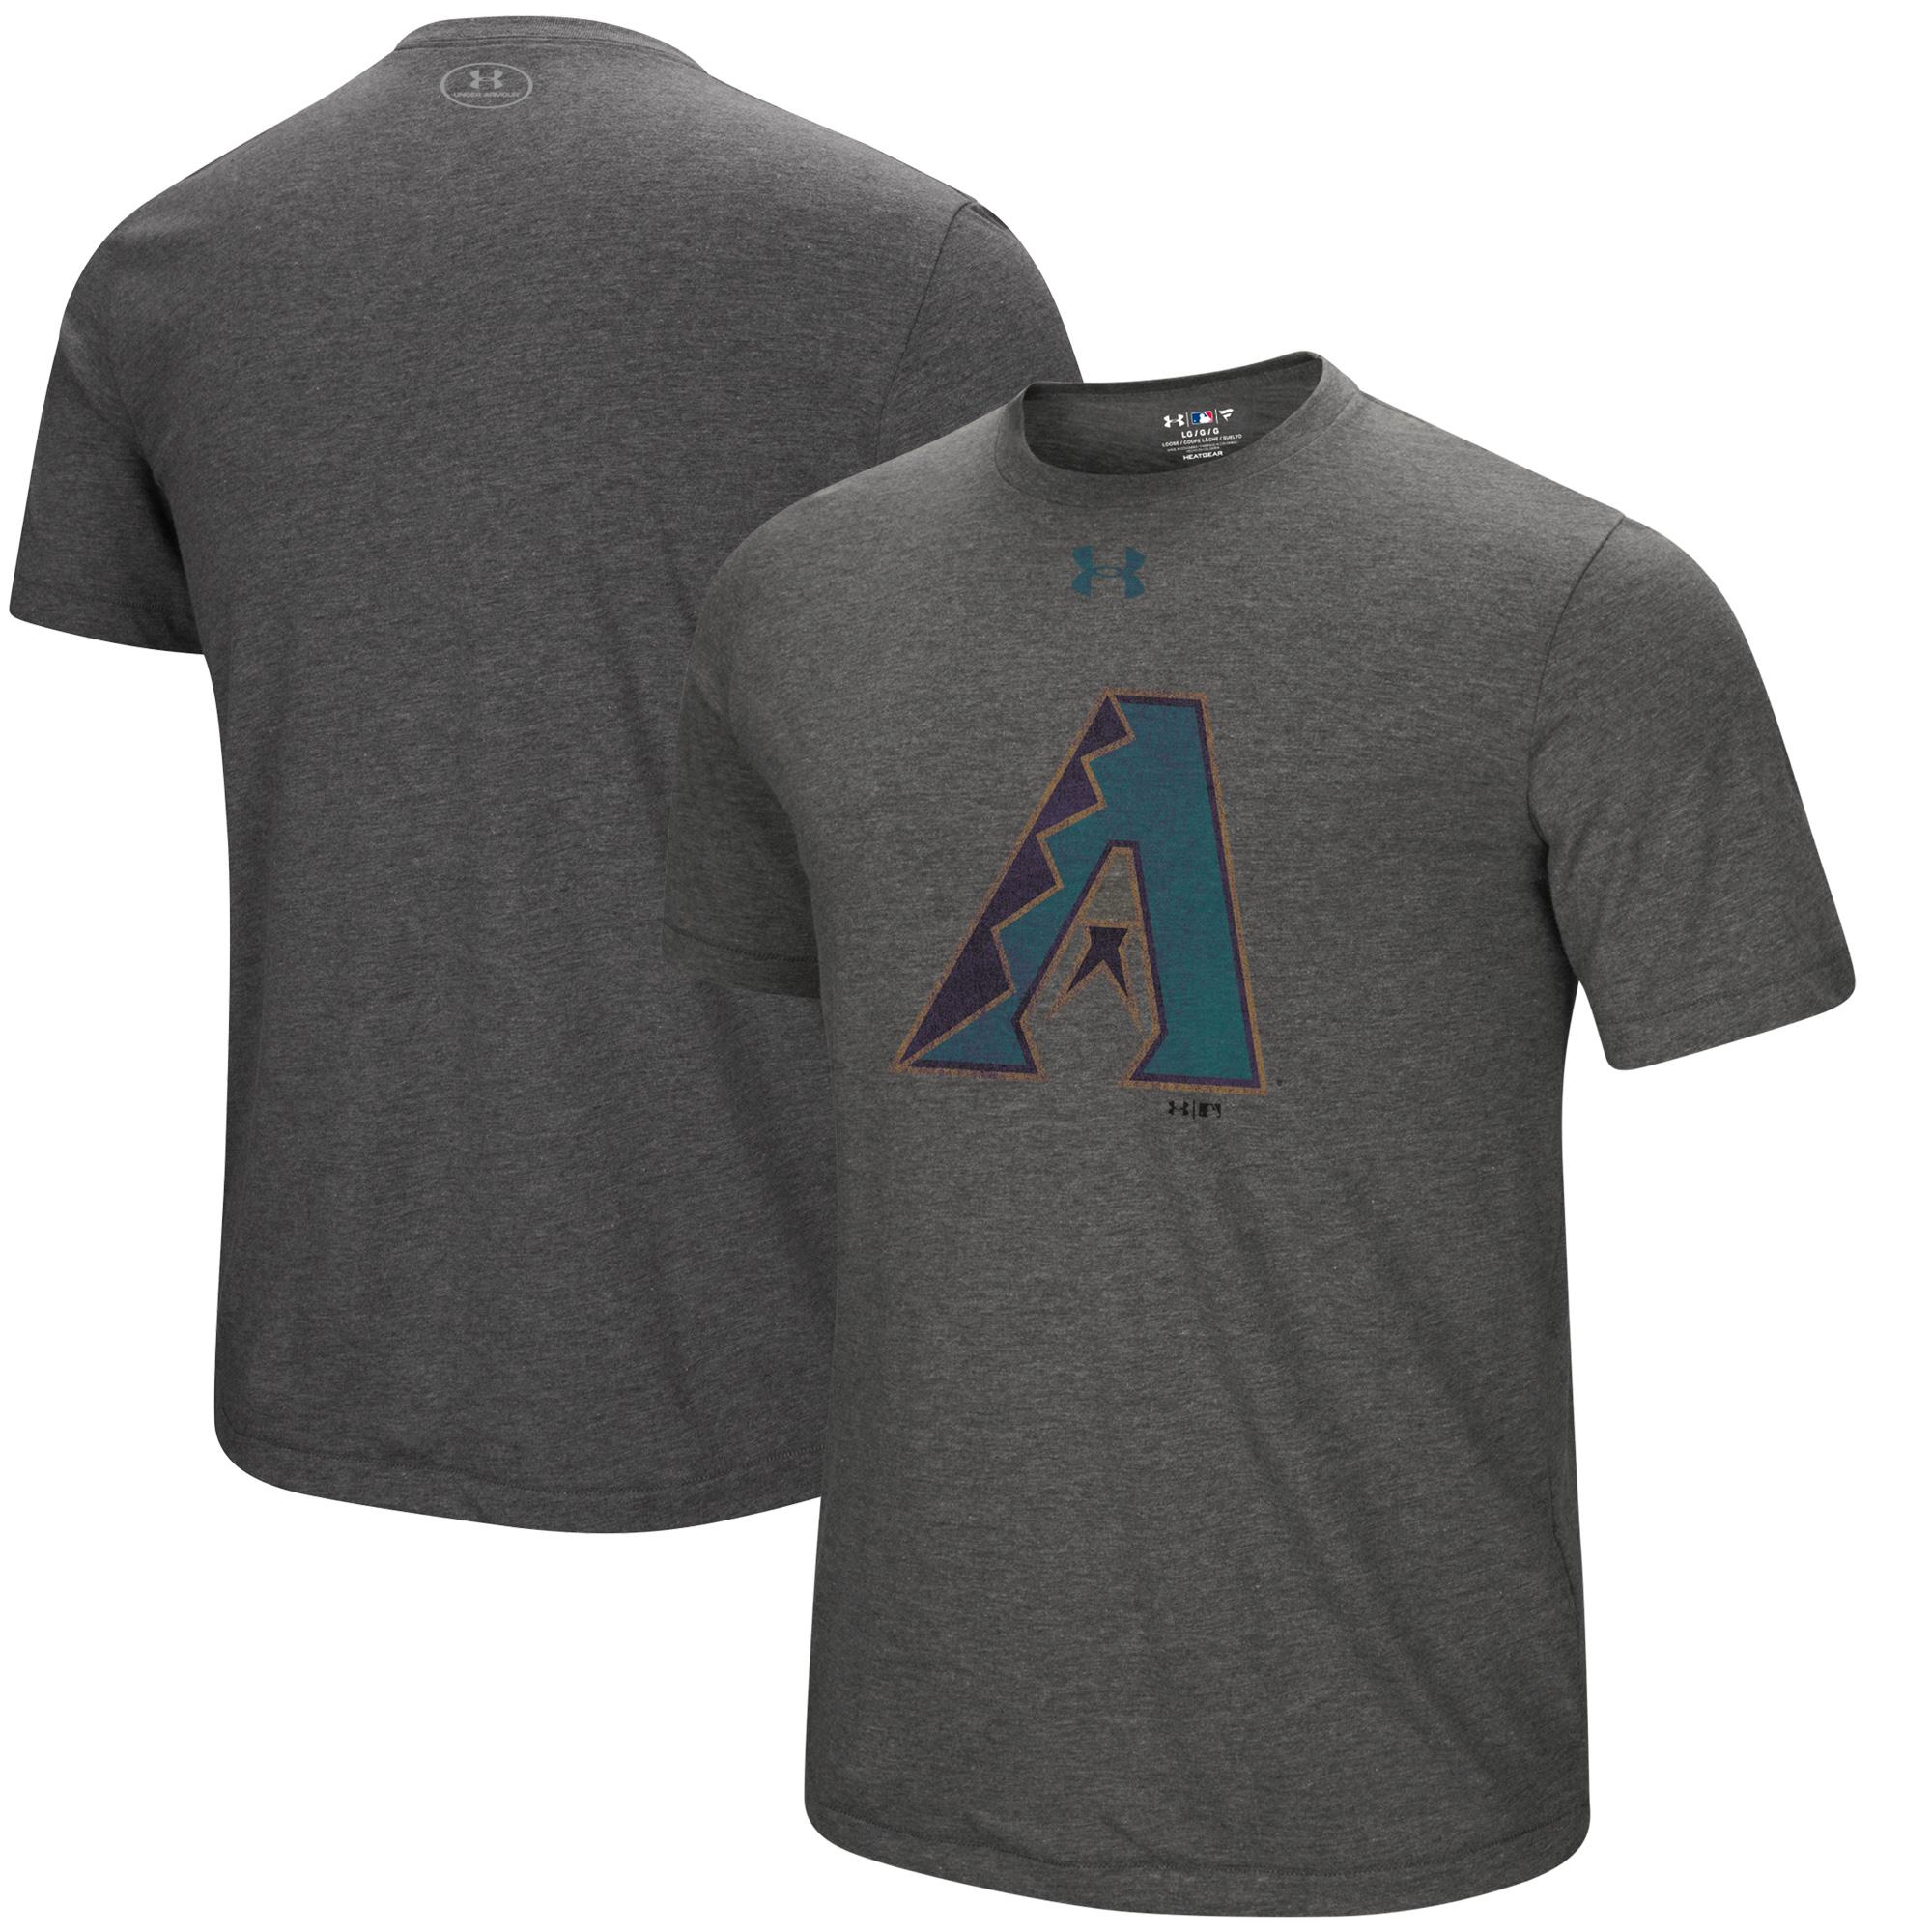 Arizona Diamondbacks Under Armour Cooperstown Collection Mark Performance Tri-Blend T-Shirt - Heathered Charcoal